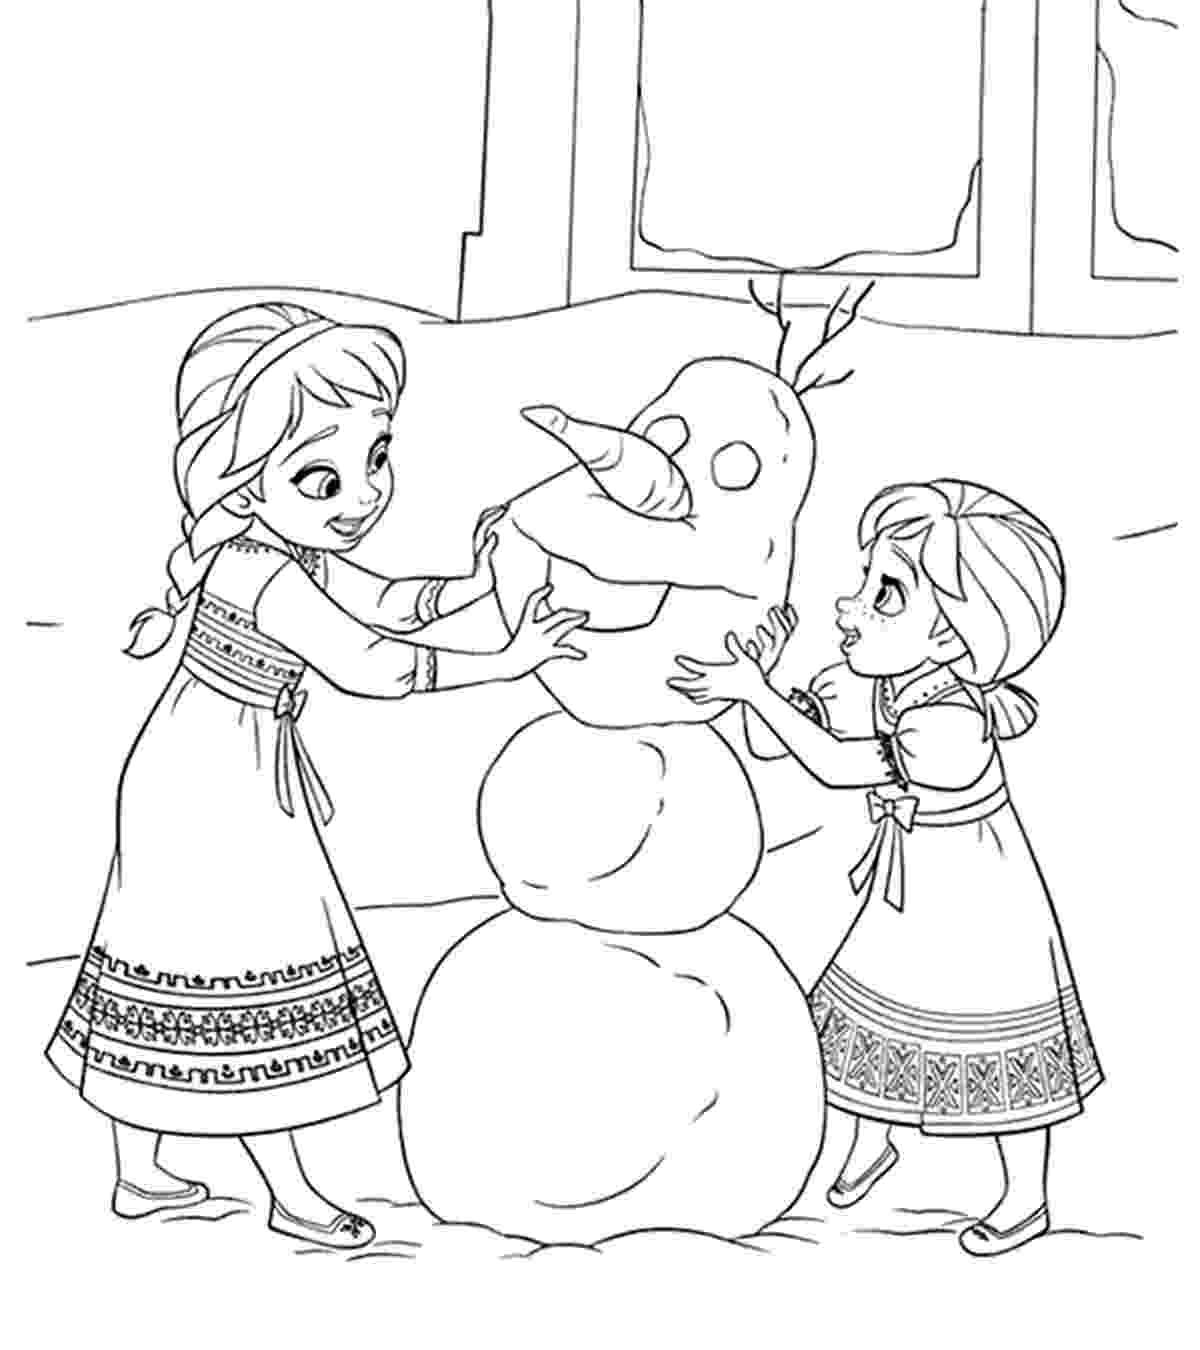 frozen free coloring pages frozen coloring pages only coloring pages pages coloring frozen free